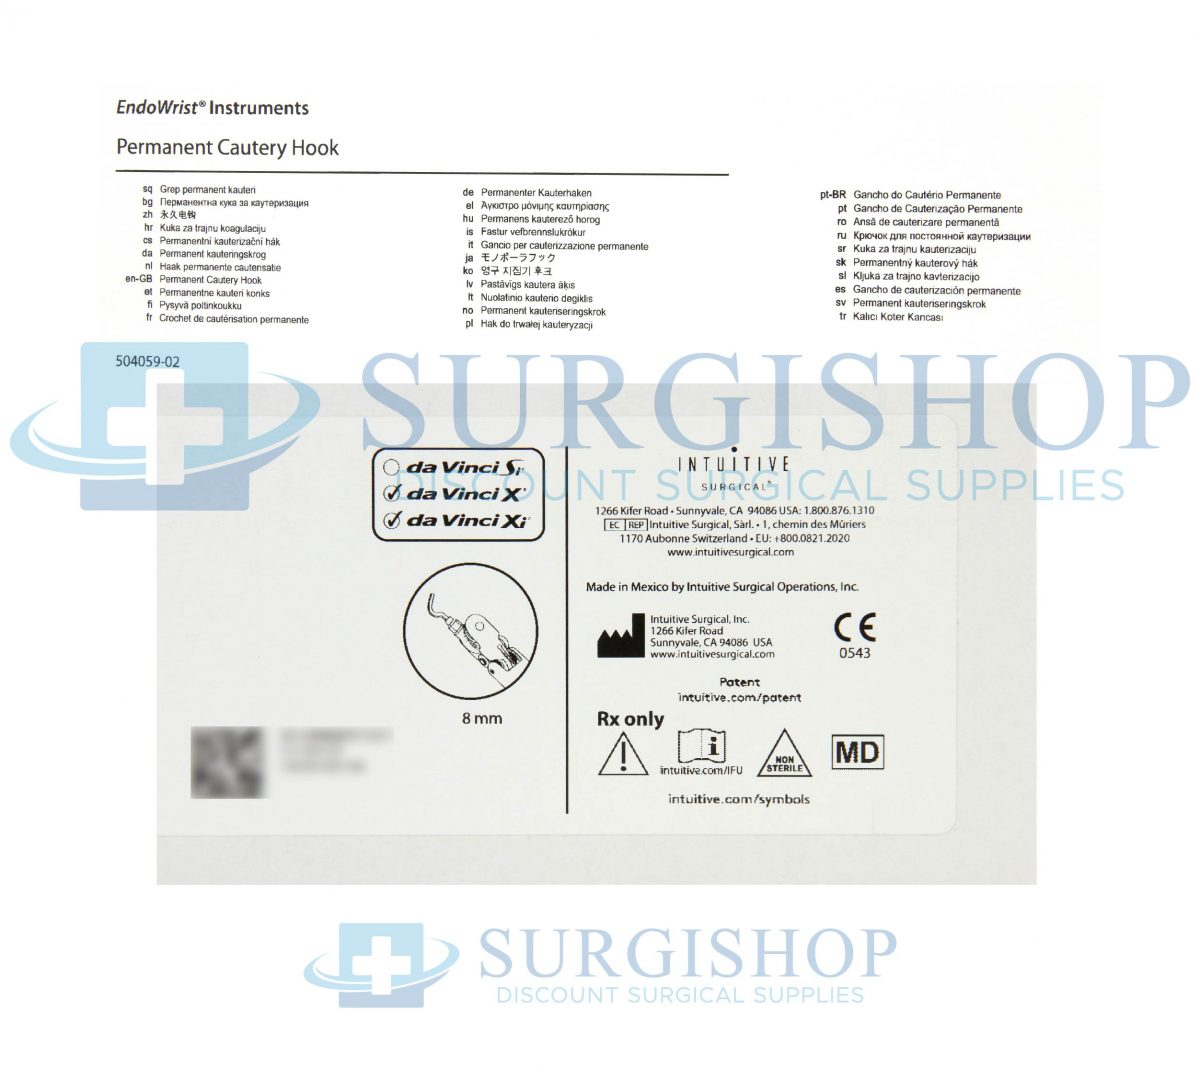 470183 – Intuitive Surgical Da Vinci X/xi 8mm Permanent Cautery Hook Each